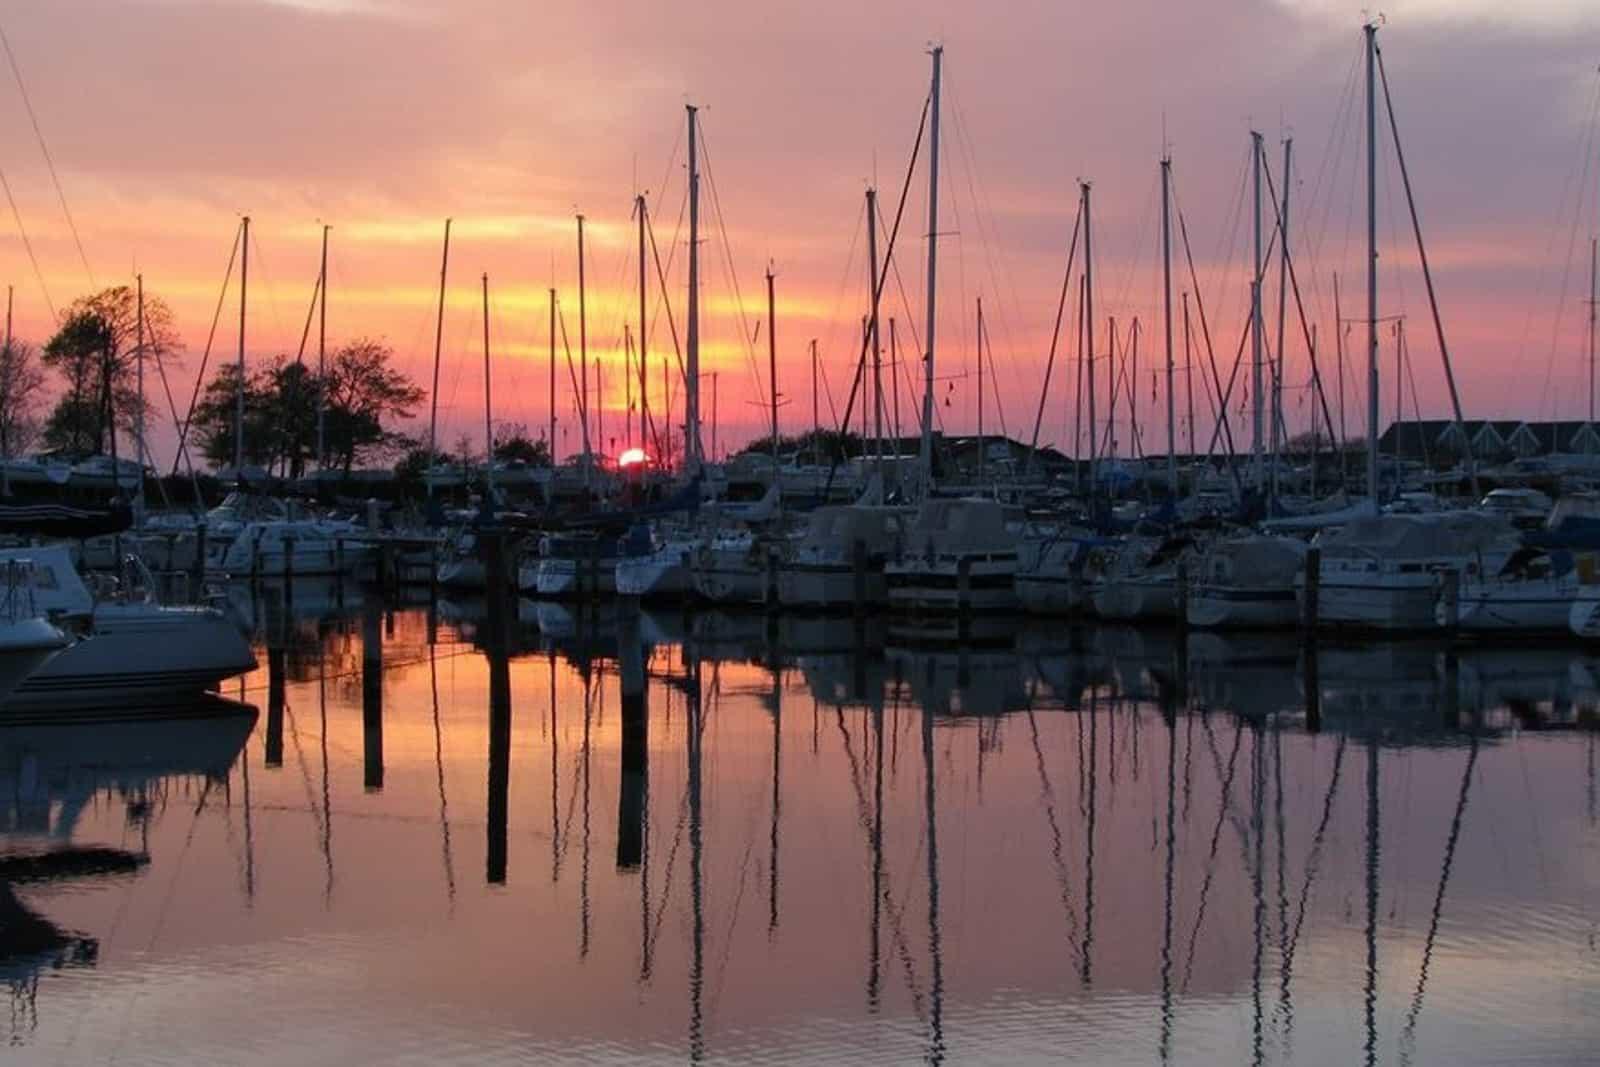 Både i marinaen ved solnedgang